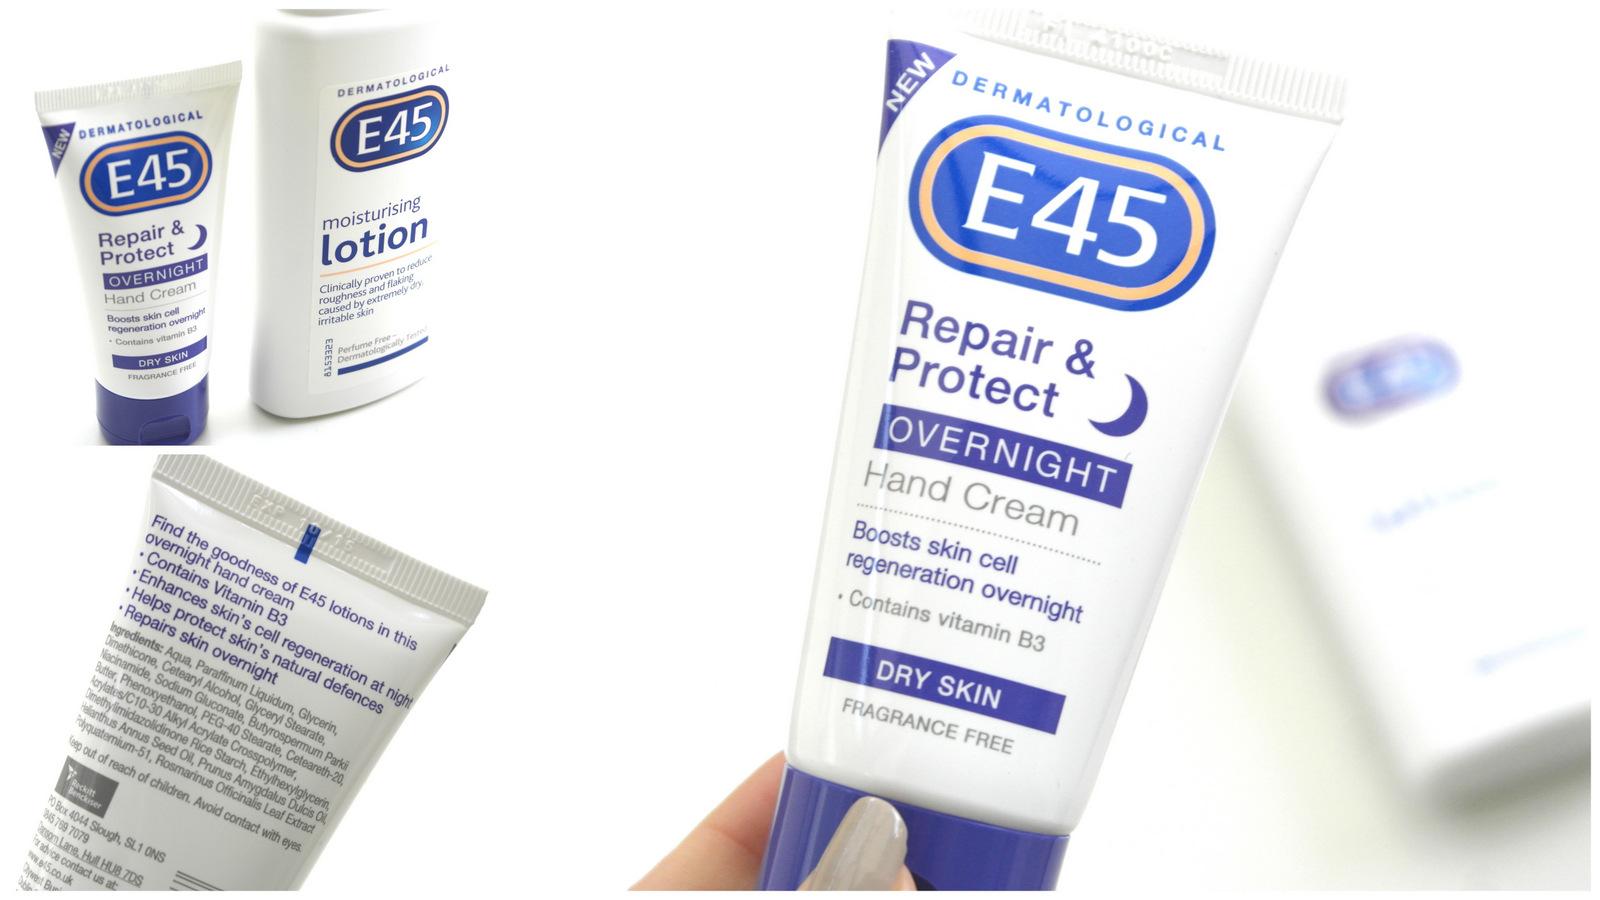 E45 Overnight Hand Cream + Lotion